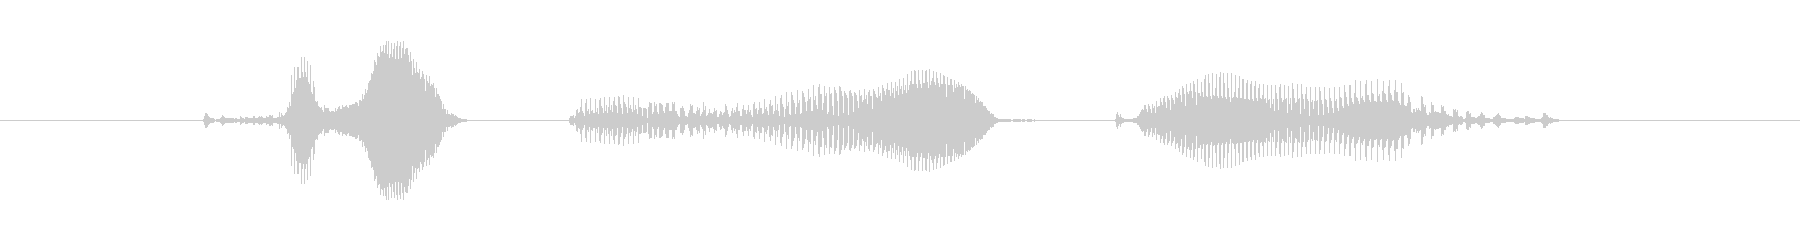 COVID-19の未再生の波形